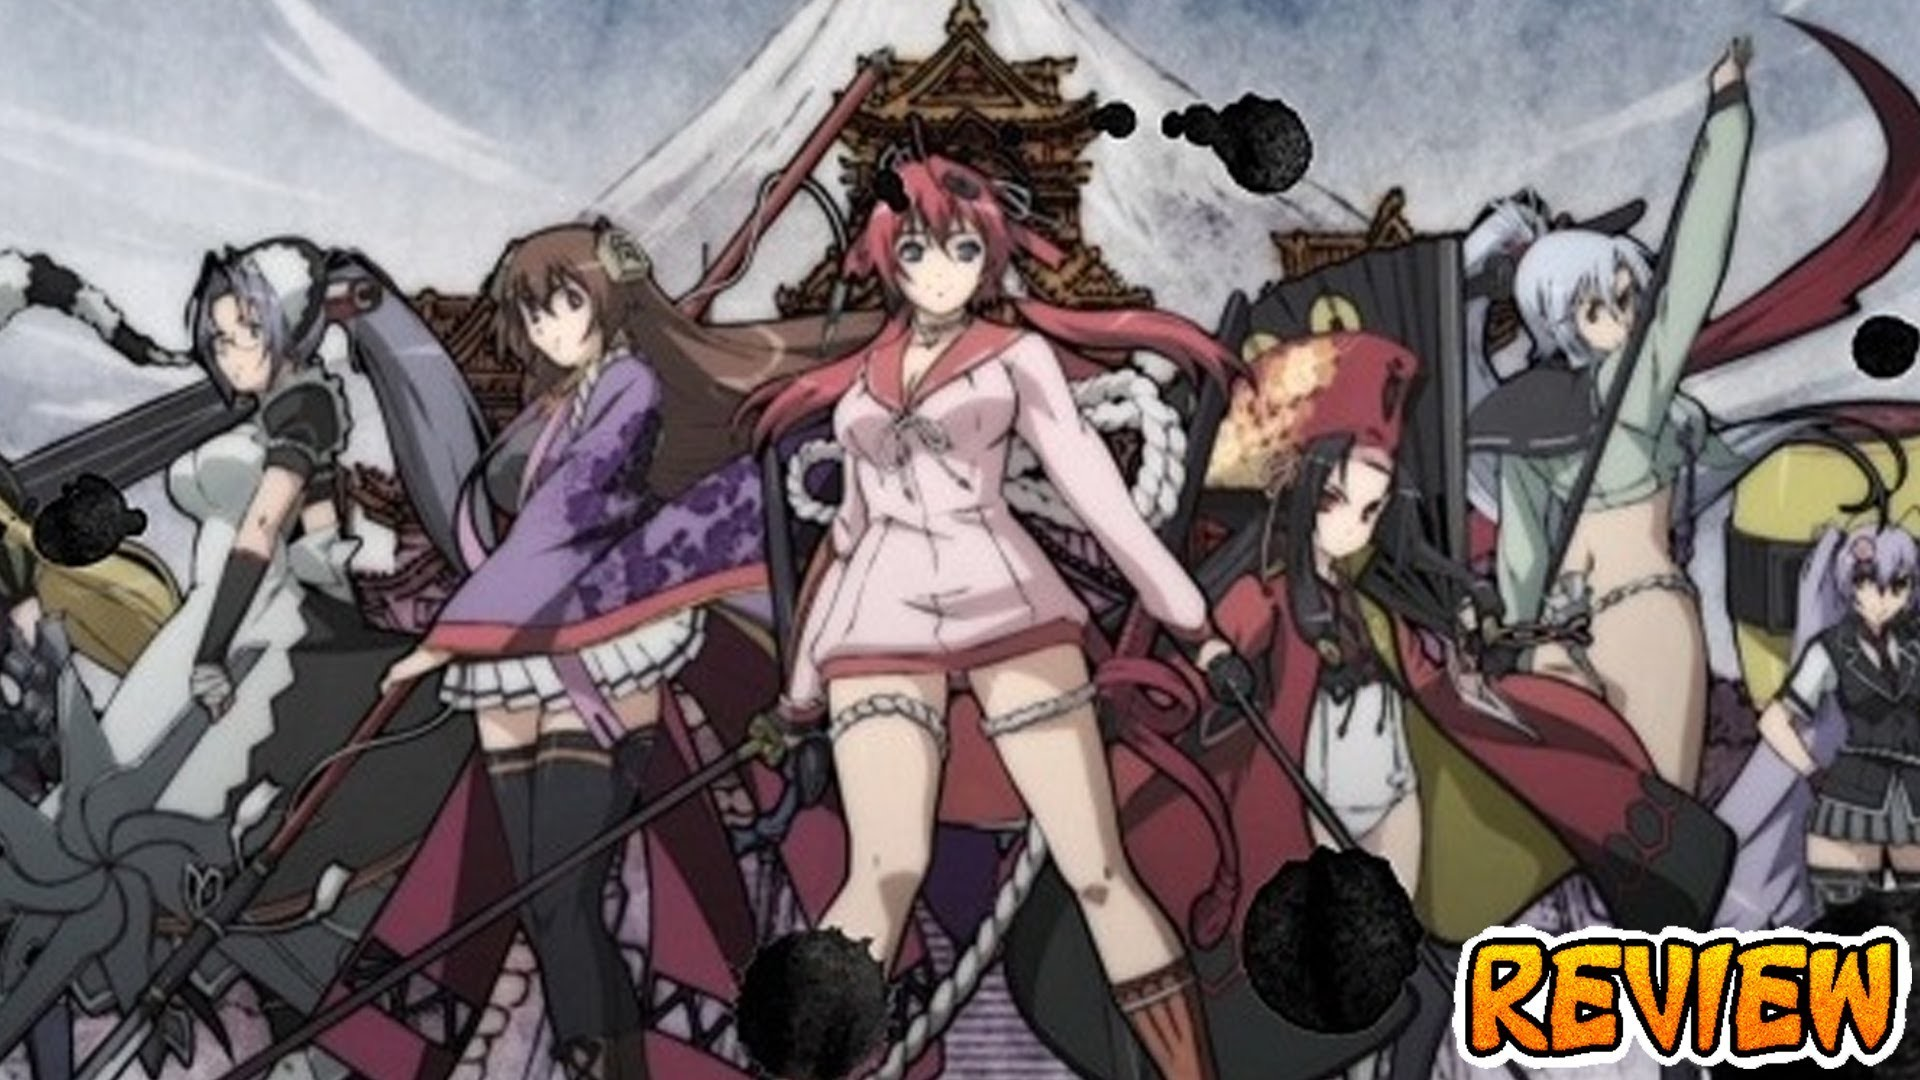 Samurai Girls – Action, Comedy, Ecchi, Harem – Anime Review #20 – YouTube